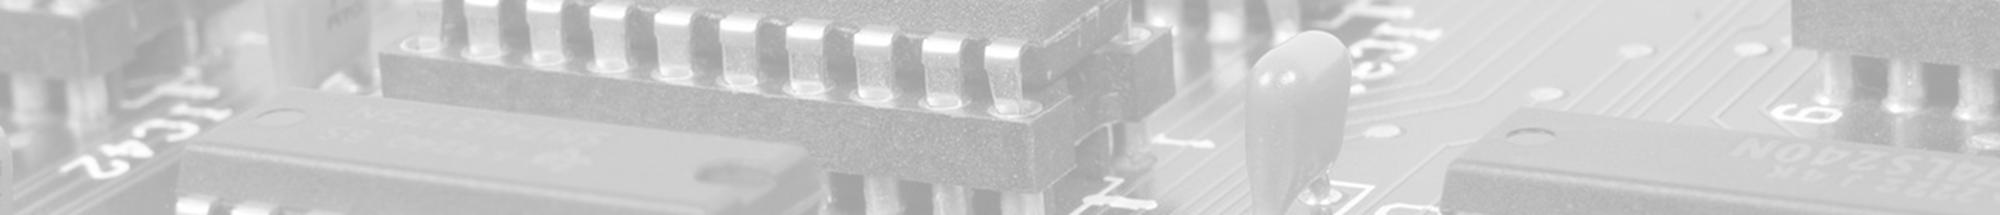 Telista hardware solutions